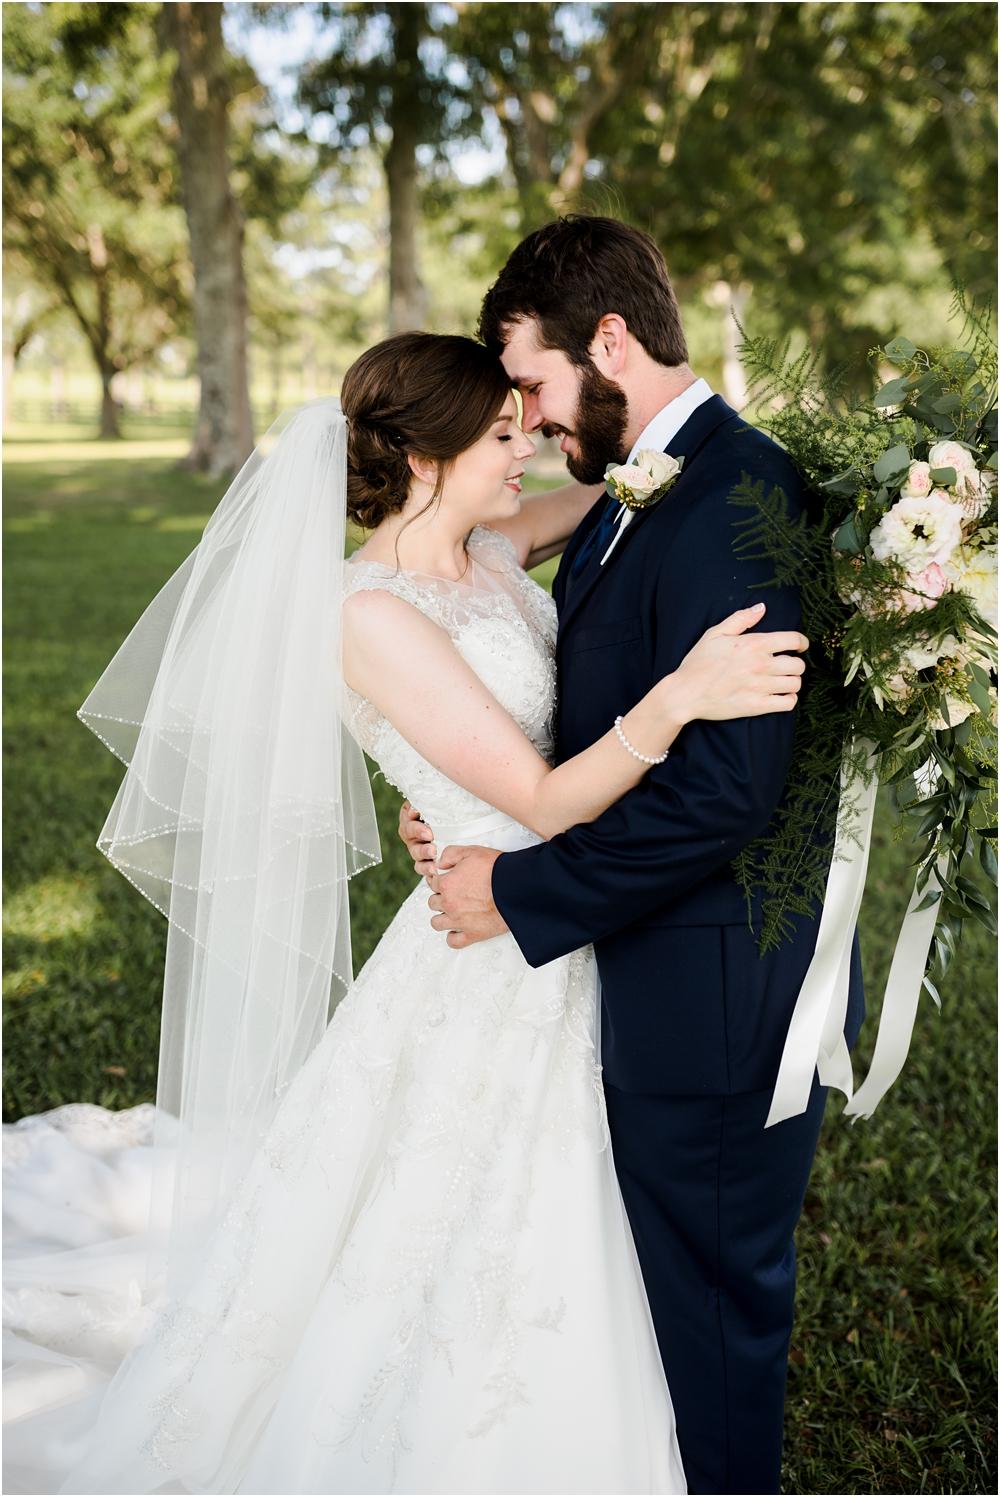 marianna-florida-wedding-photographer-kiersten-grant-72.jpg